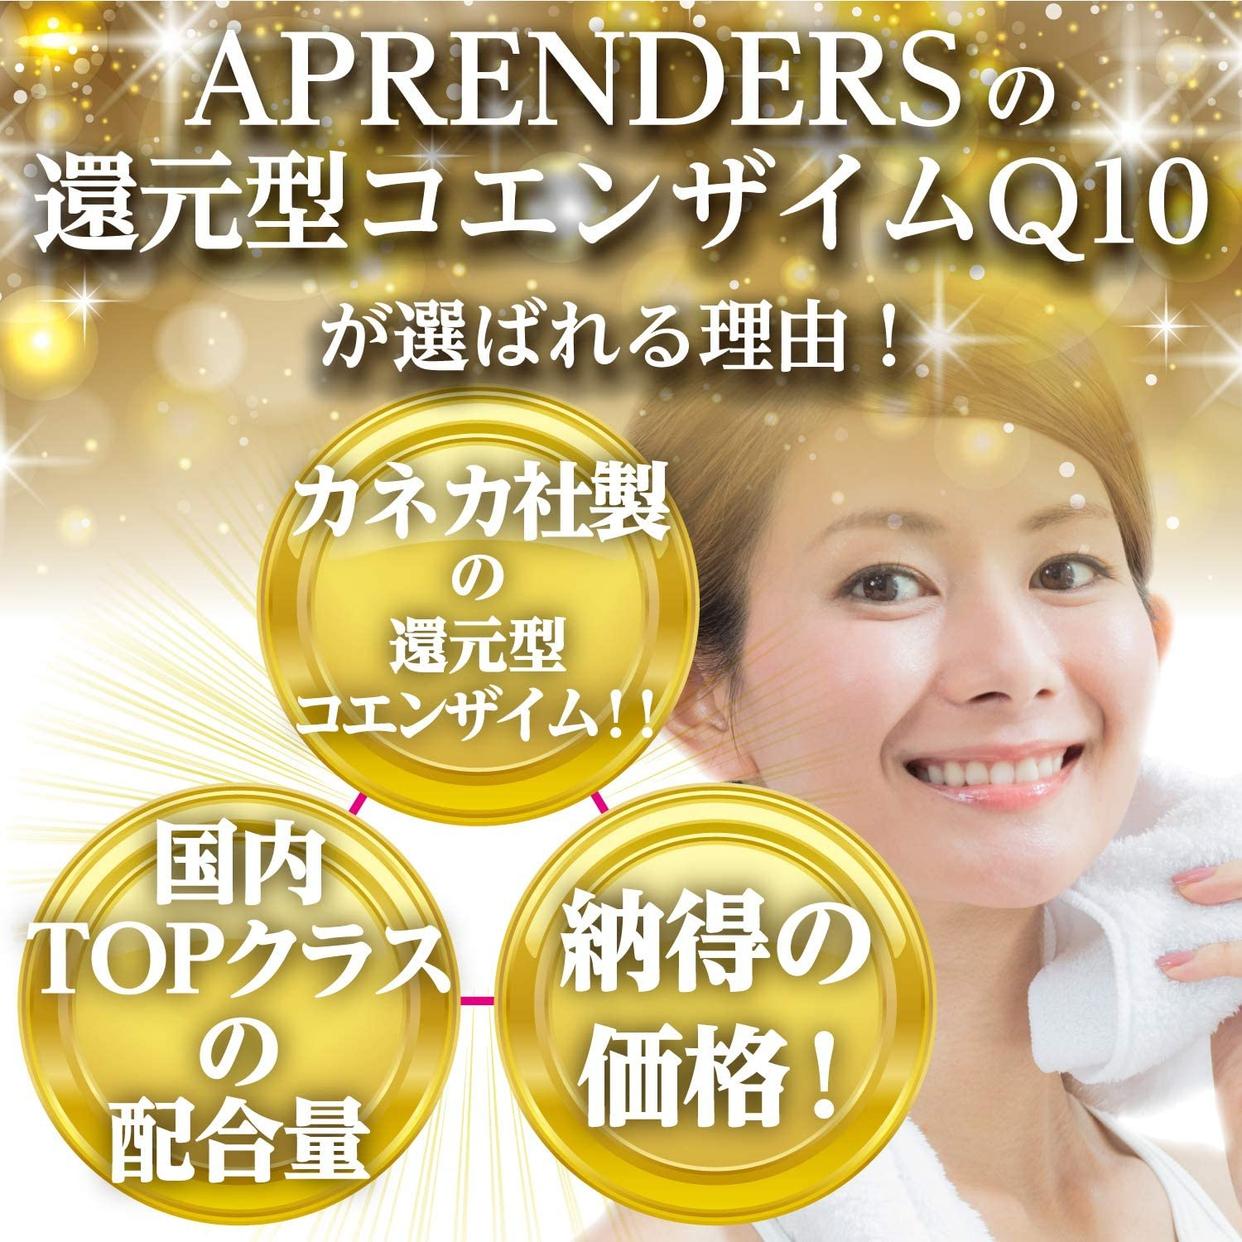 APRENDERS(アプレンダーズ) 還元型コエンザイムQ10の商品画像2